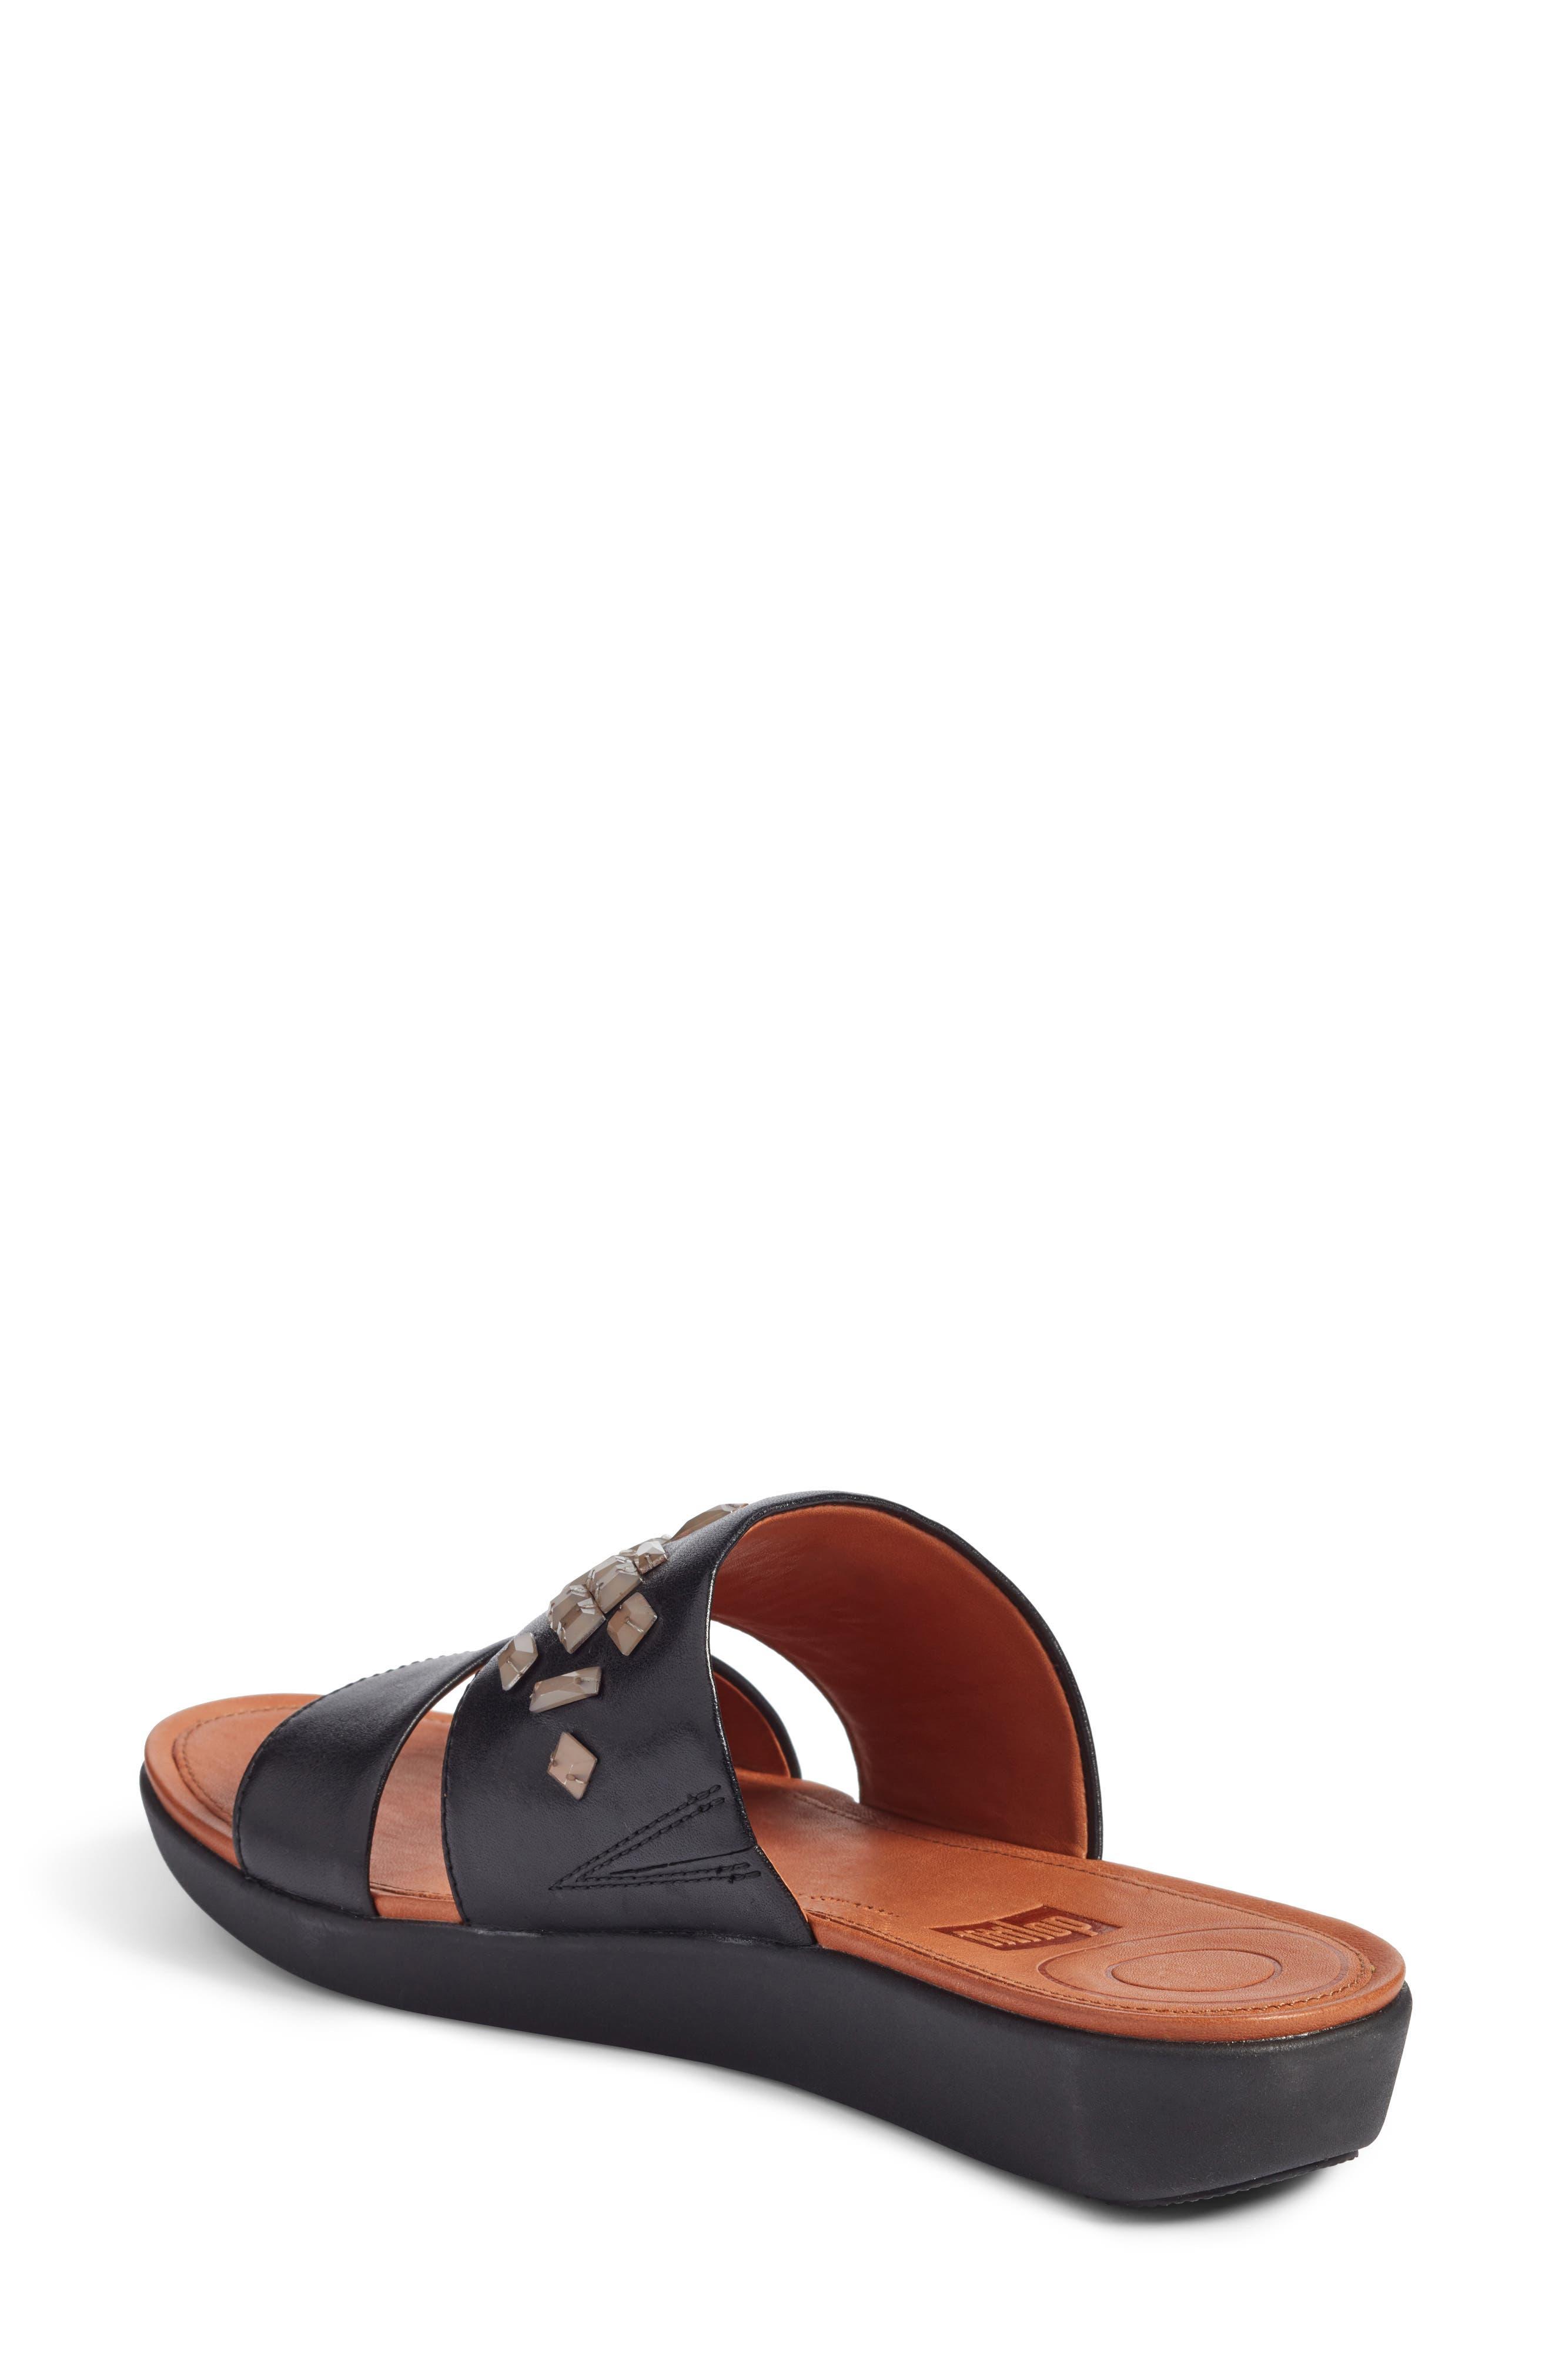 Delta Slide Sandal,                             Alternate thumbnail 2, color,                             BLACK LEATHER